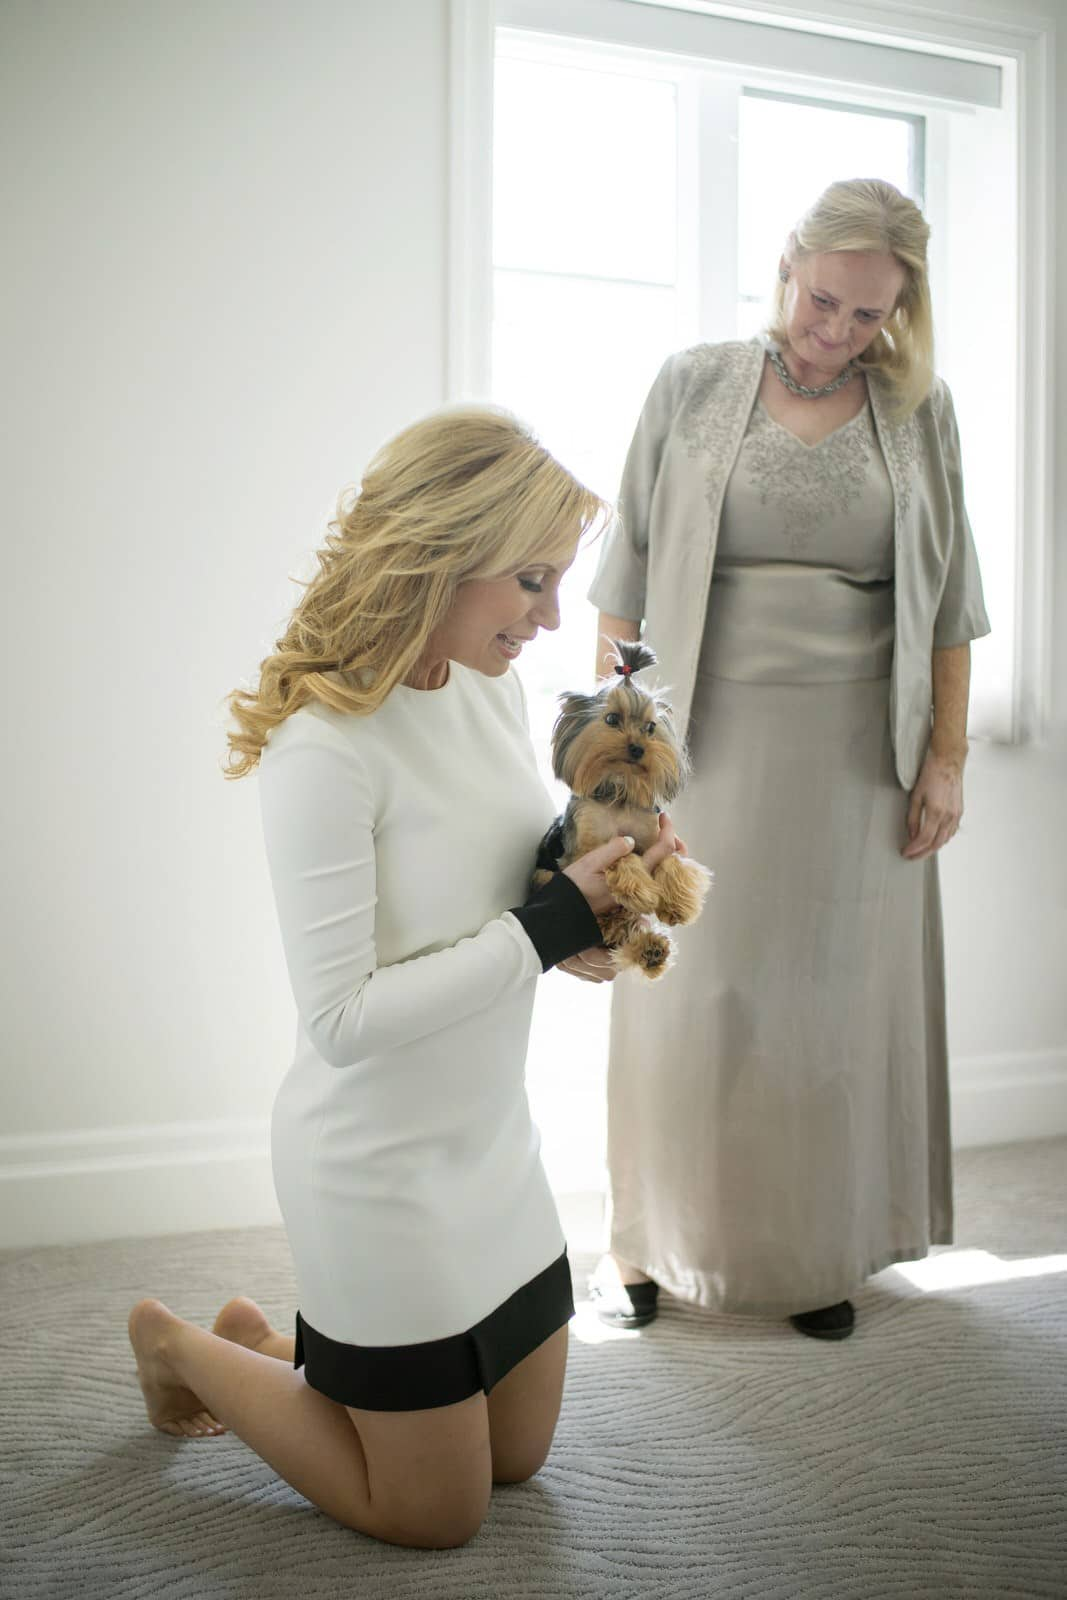 david julia dog york terrier puppy jatoba jewish wedding old couple beth israel aaron synagogue cote st luc